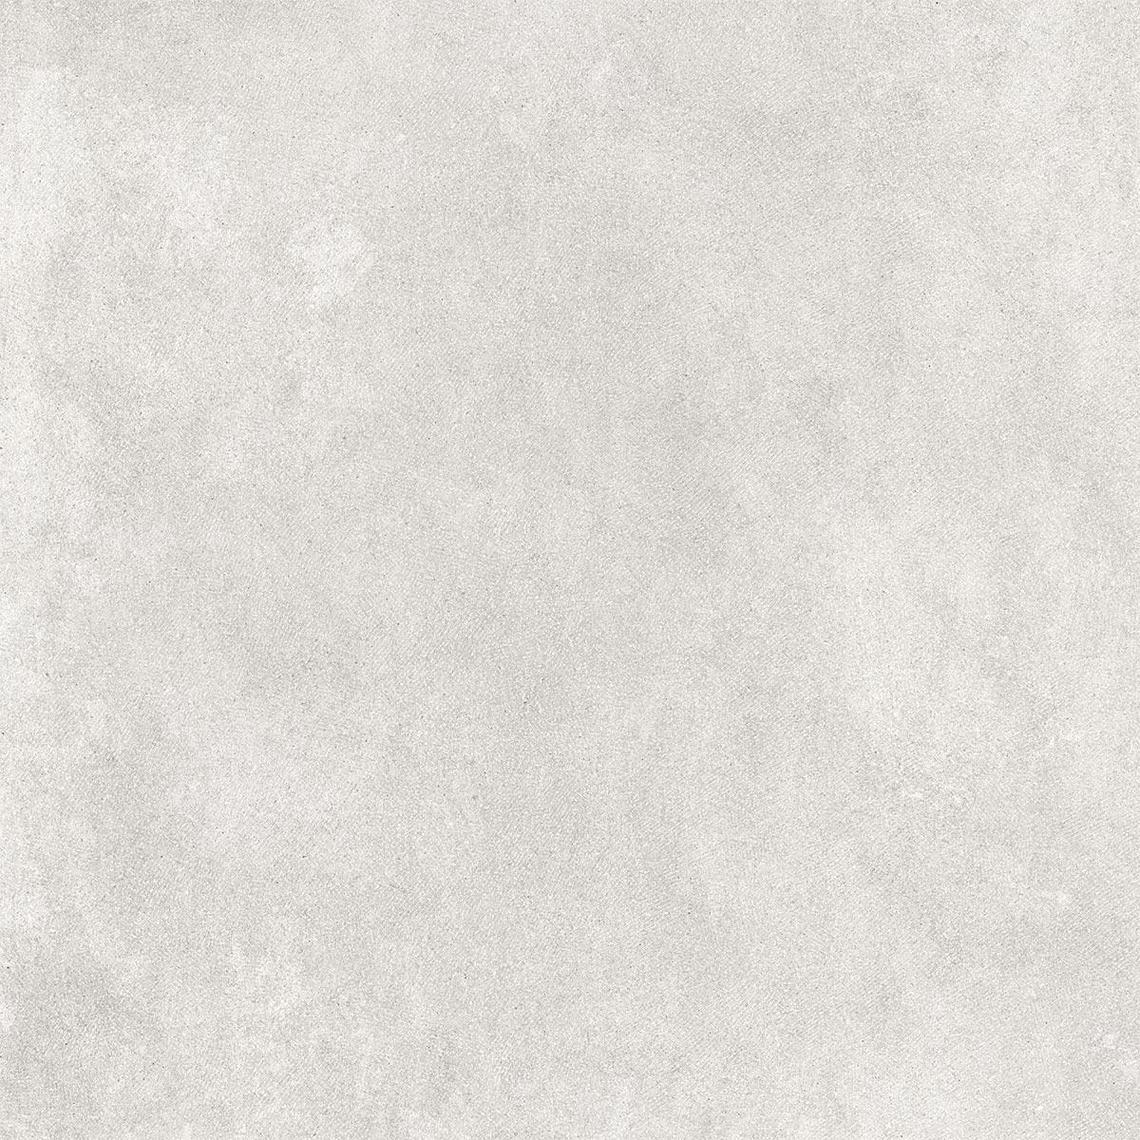 HERMES STEEL MATT RECT. (120x120)